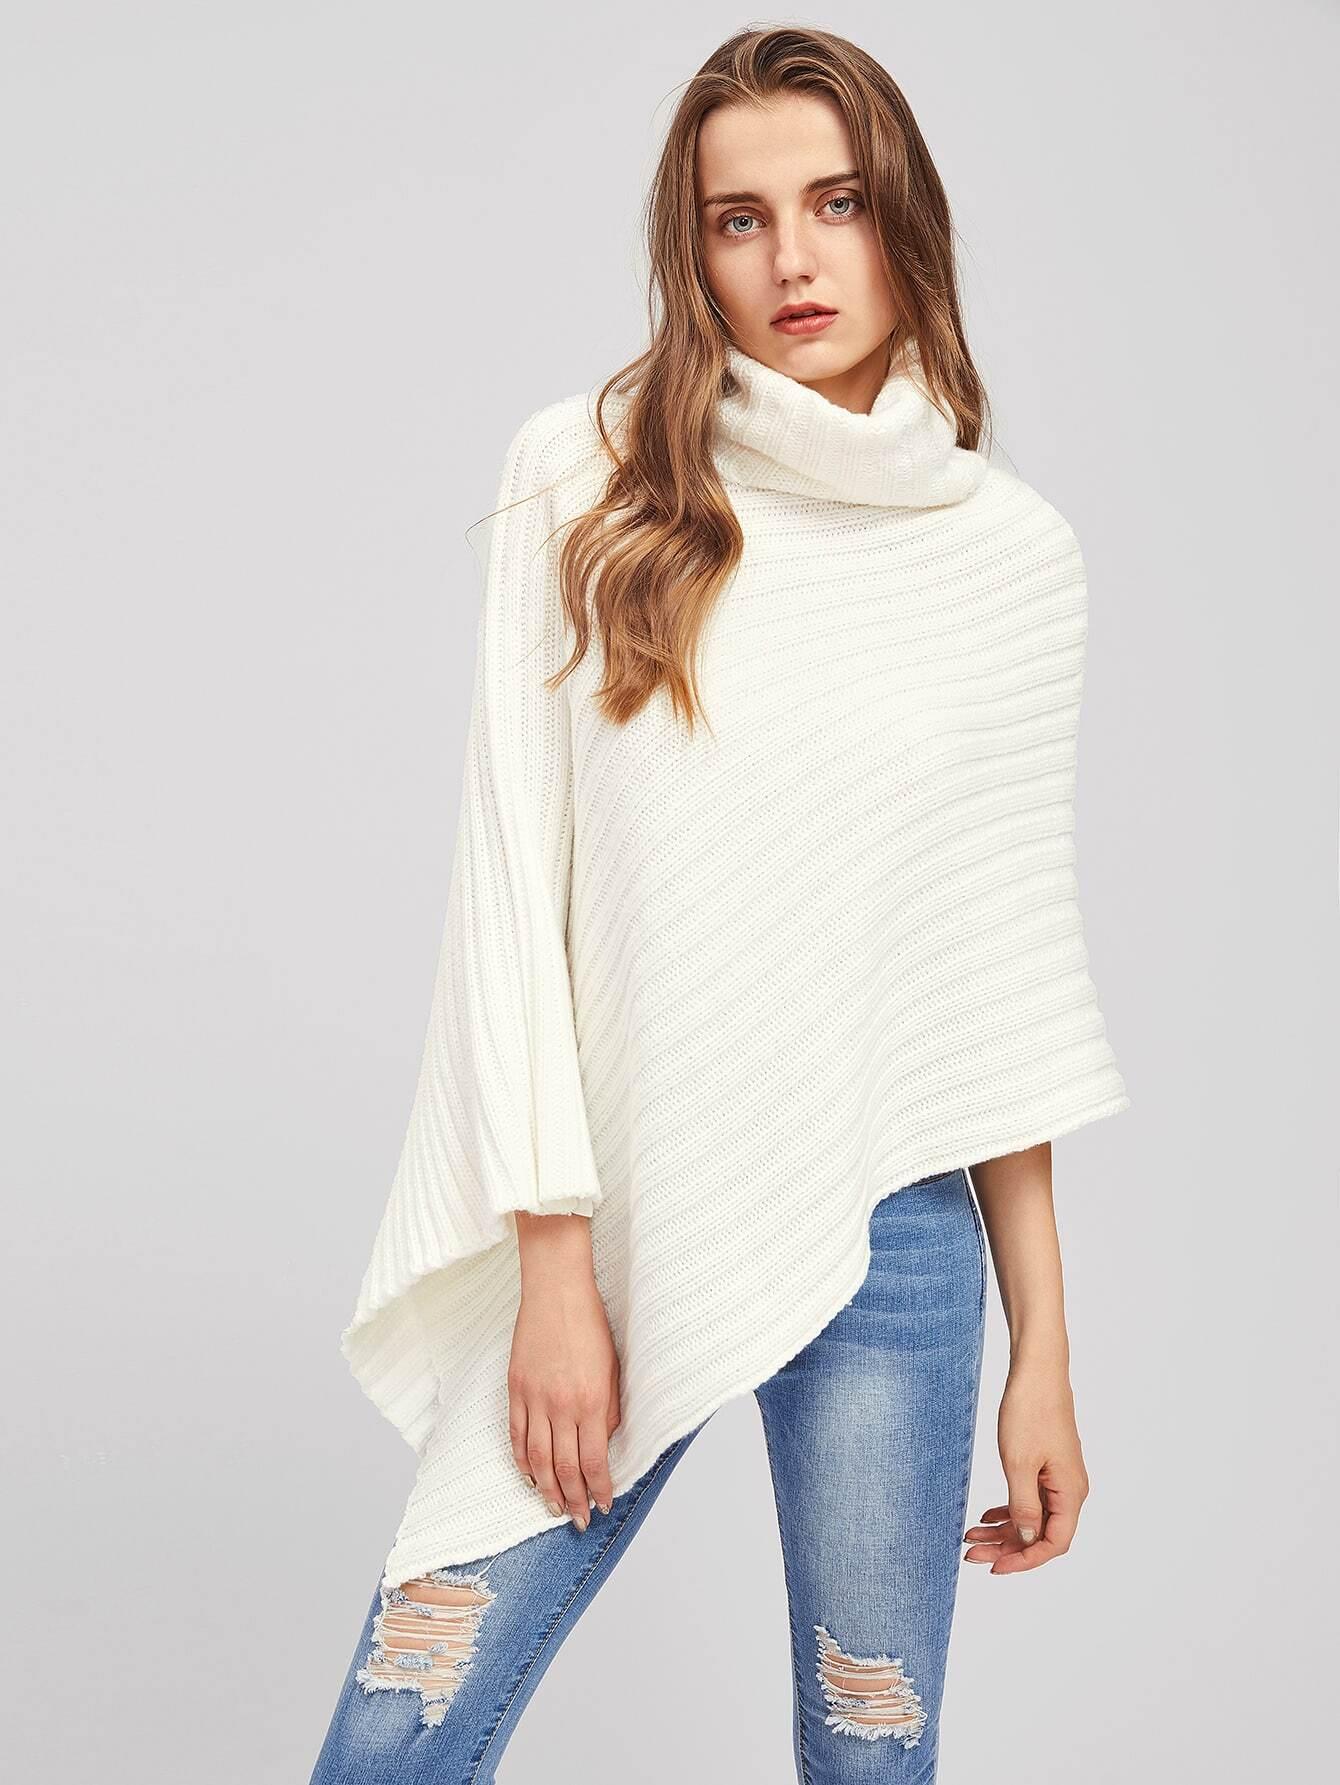 Rib Knit Asymmetric Poncho Jumper sweater170718459